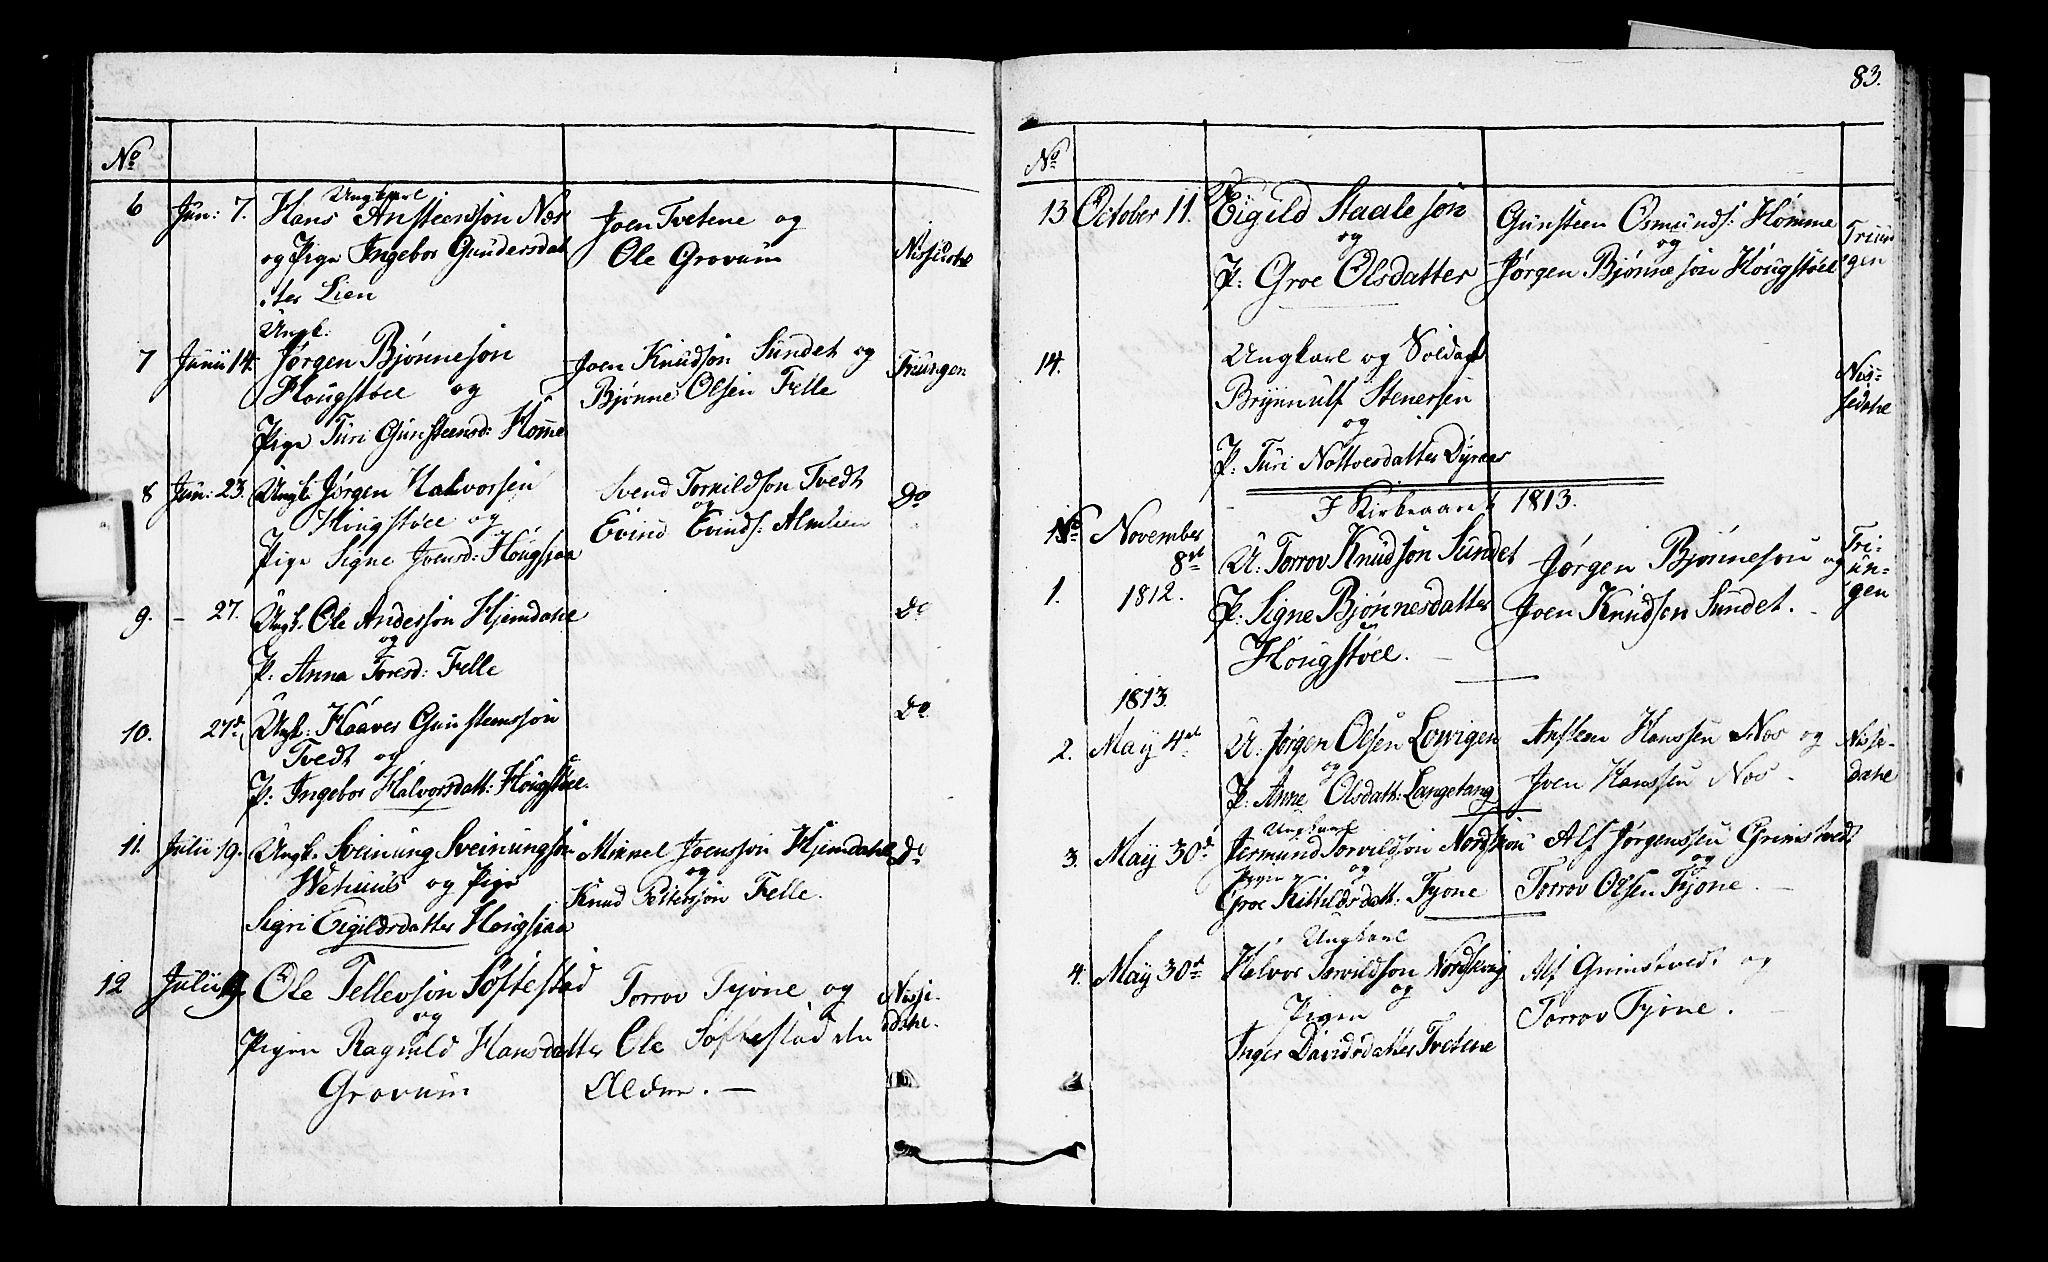 SAKO, Nissedal kirkebøker, F/Fa/L0001: Ministerialbok nr. I 1, 1811-1814, s. 83